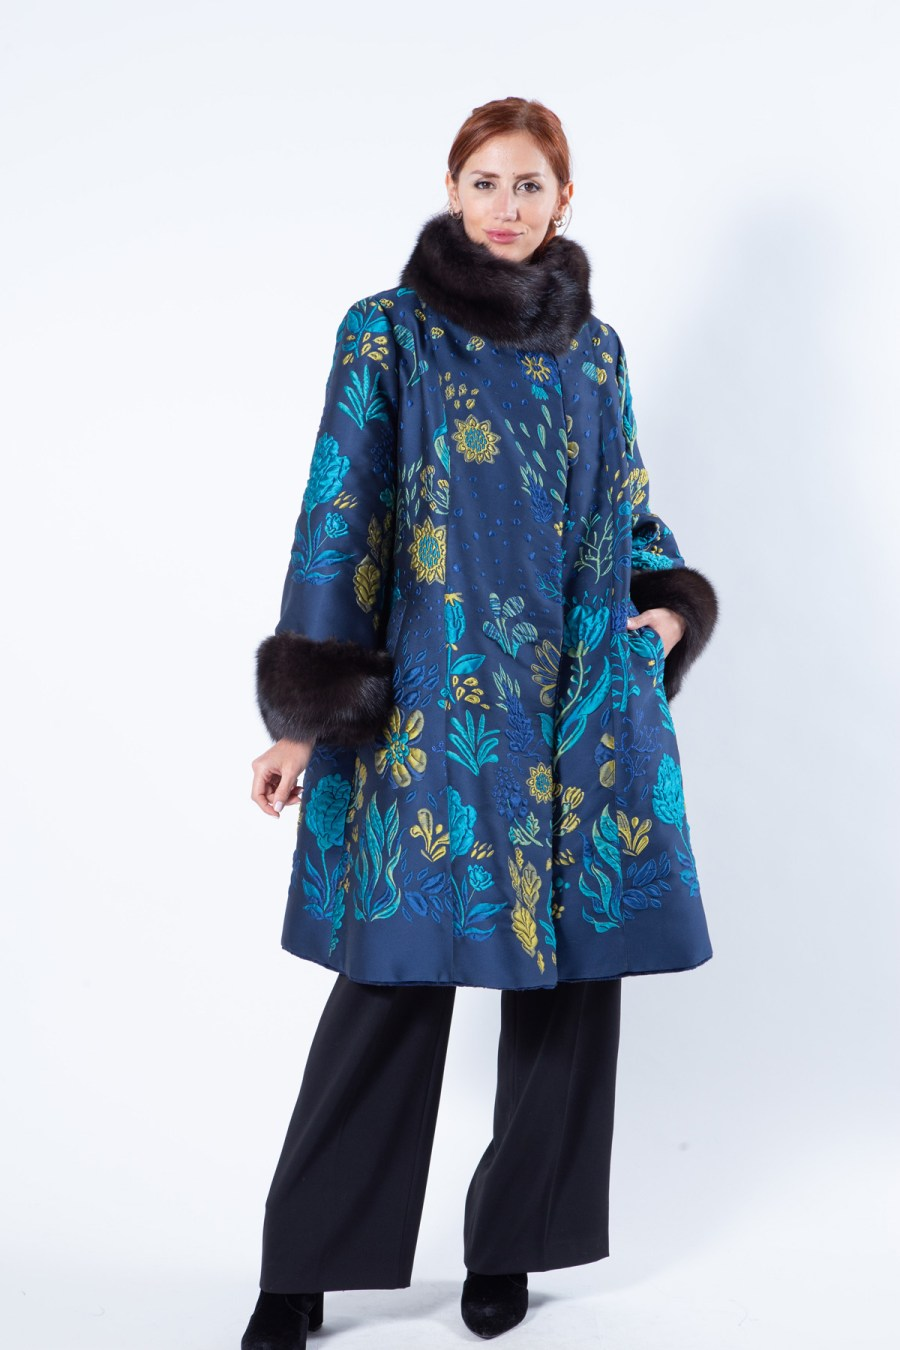 Double-faced Royal Blue Sheared Mink and Fabric Coat | Sarigianni Furs